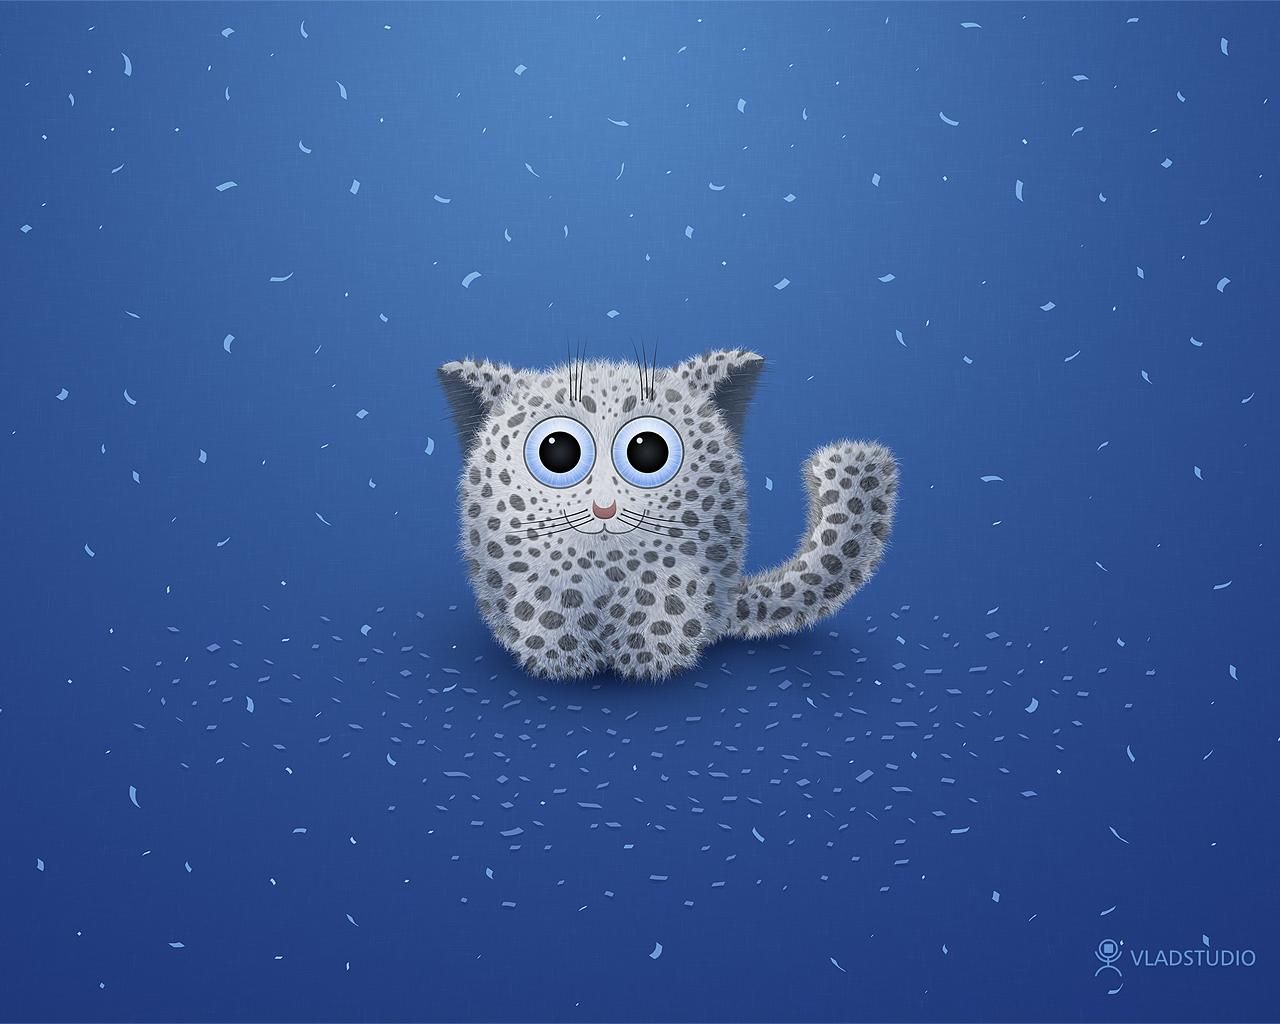 http://4.bp.blogspot.com/-16vo5ESTs1Y/Tfzw5WYmT9I/AAAAAAAAIVE/hM_gDb7iB-U/s1600/2-1316-snow_leopard.jpg